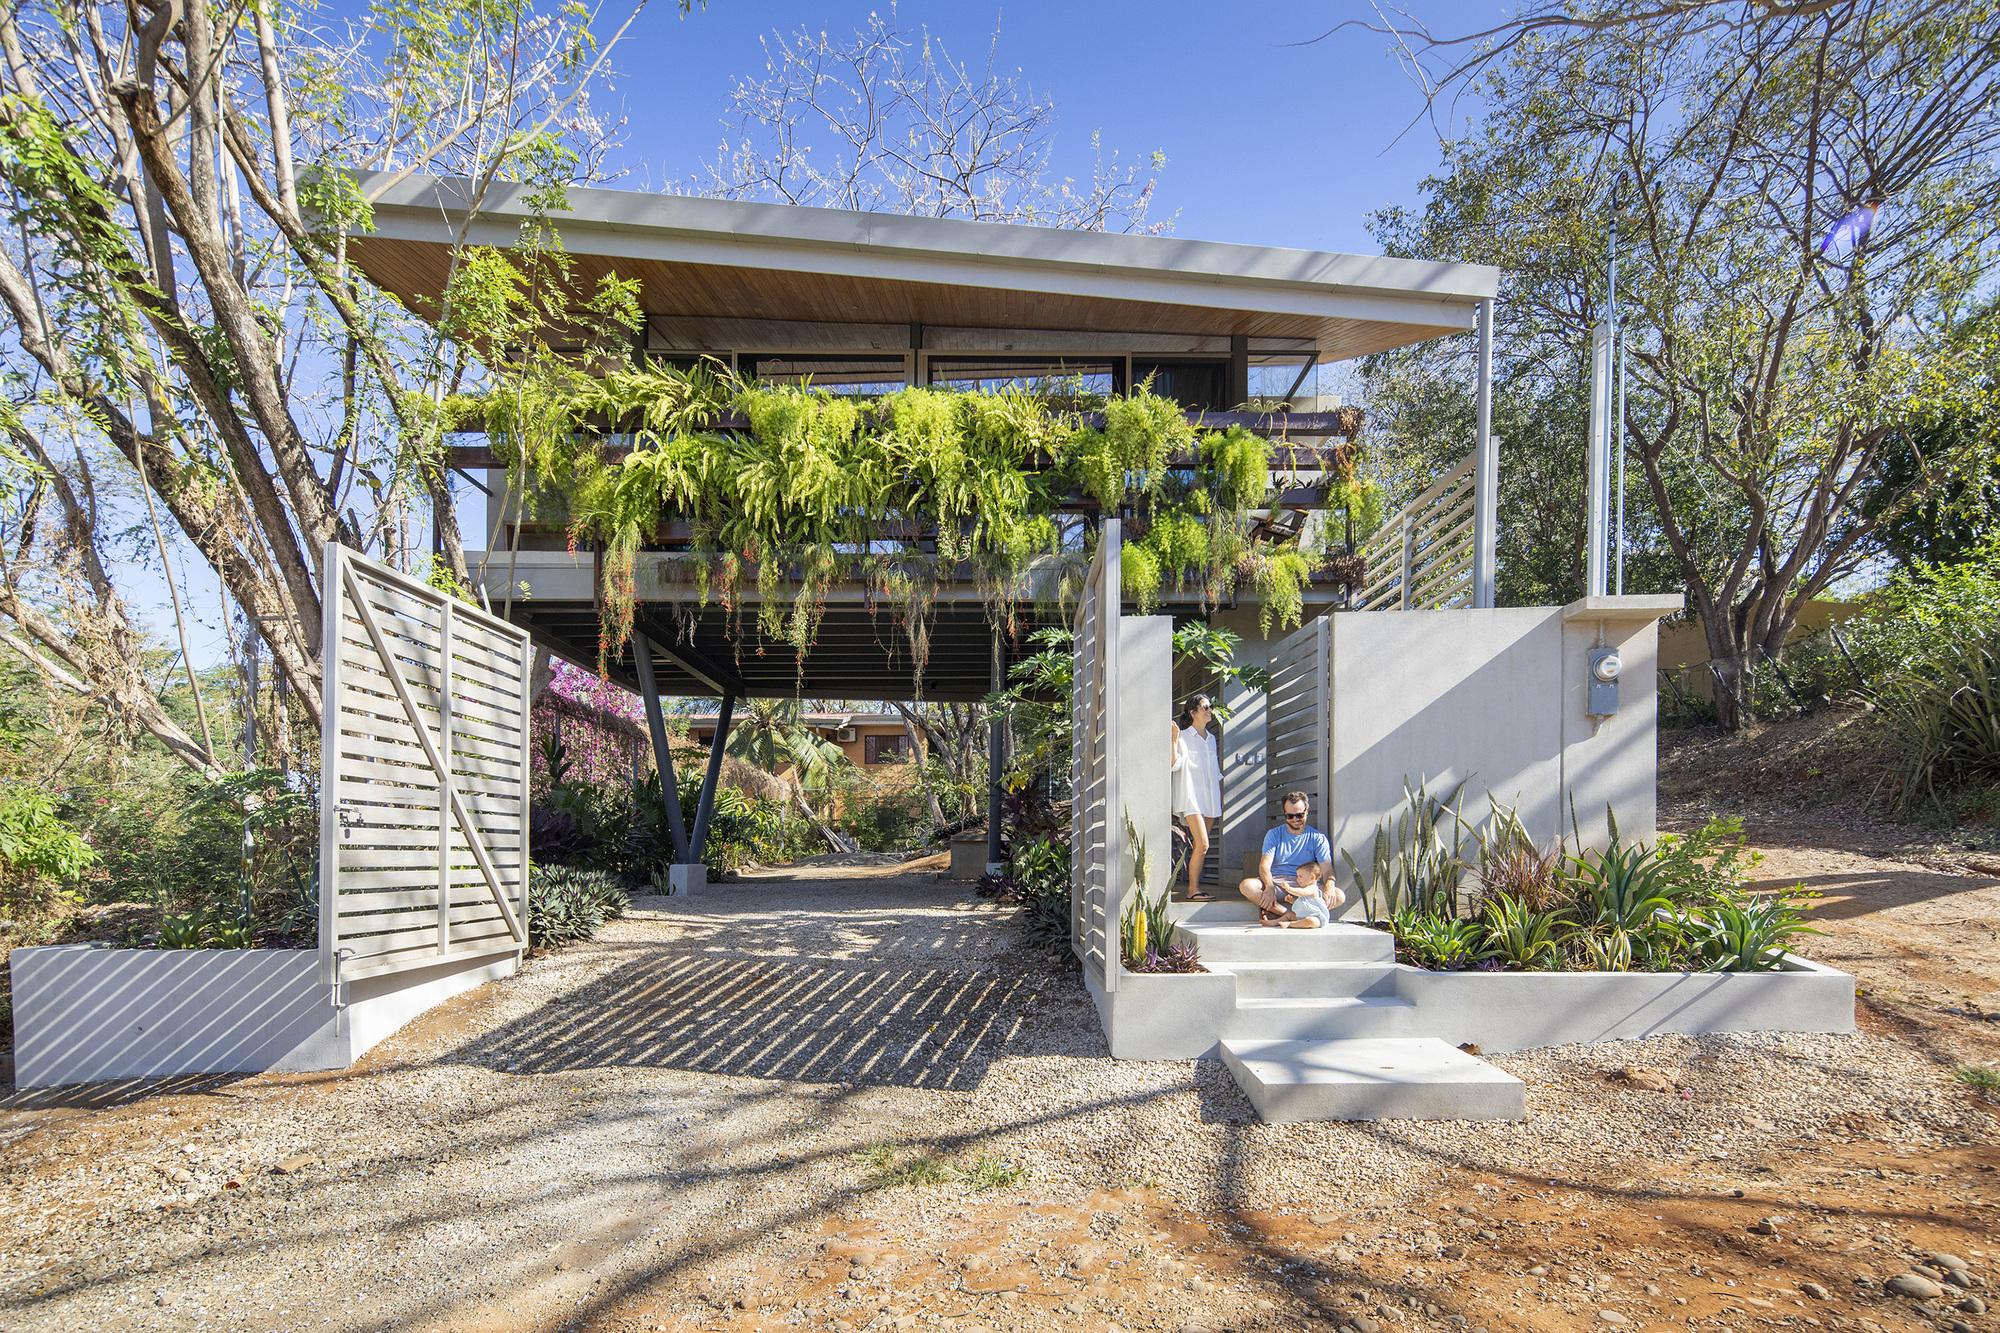 Garden House / LSD Architects